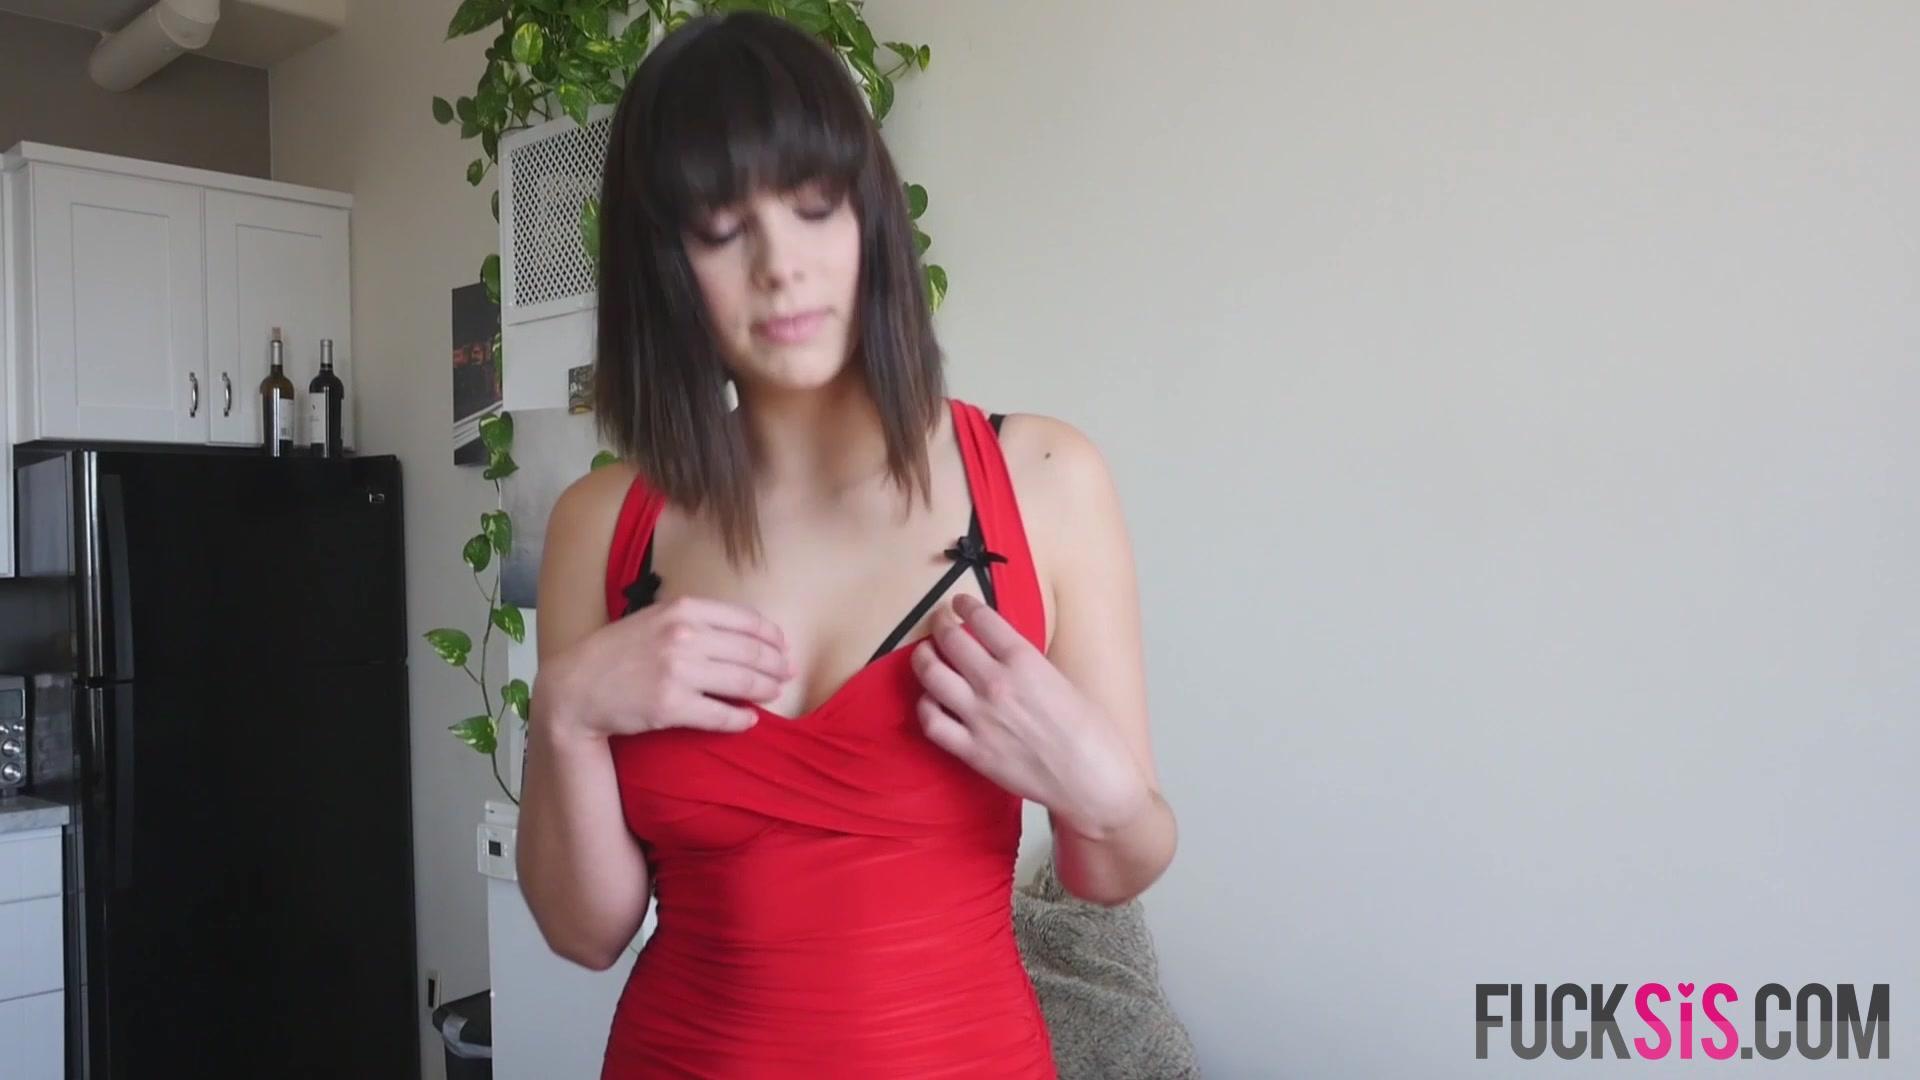 Dj chipman wu tang naked hustle Sexy Video